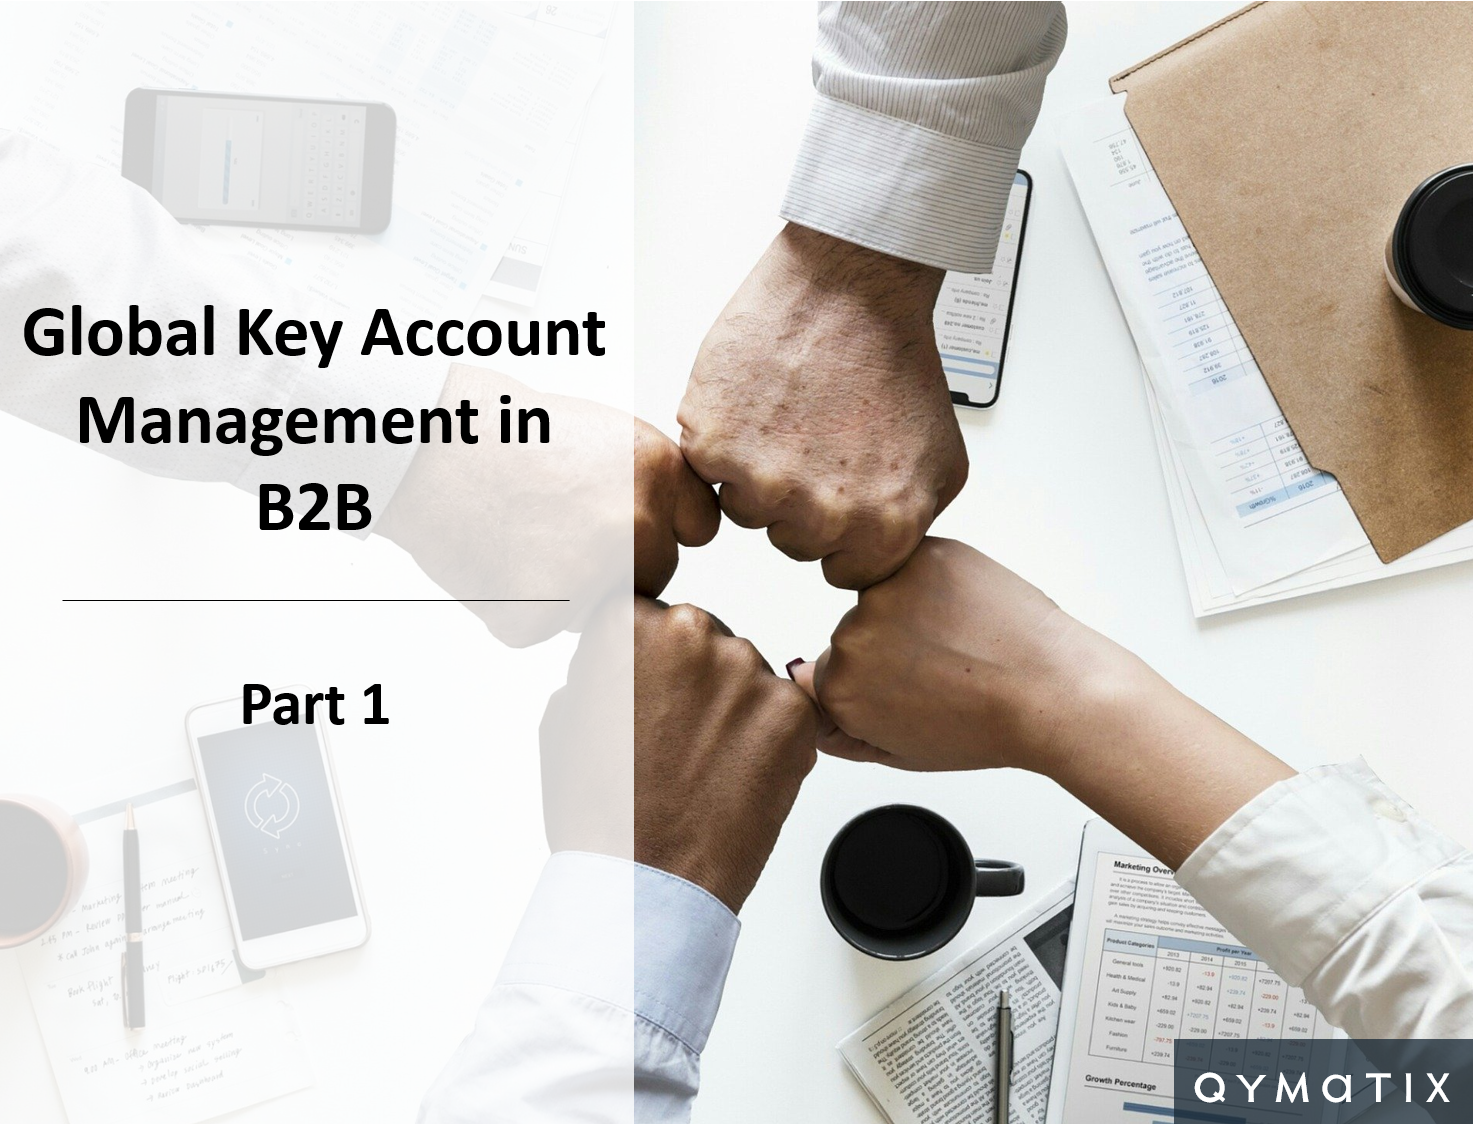 Global Key Account Management in B2B